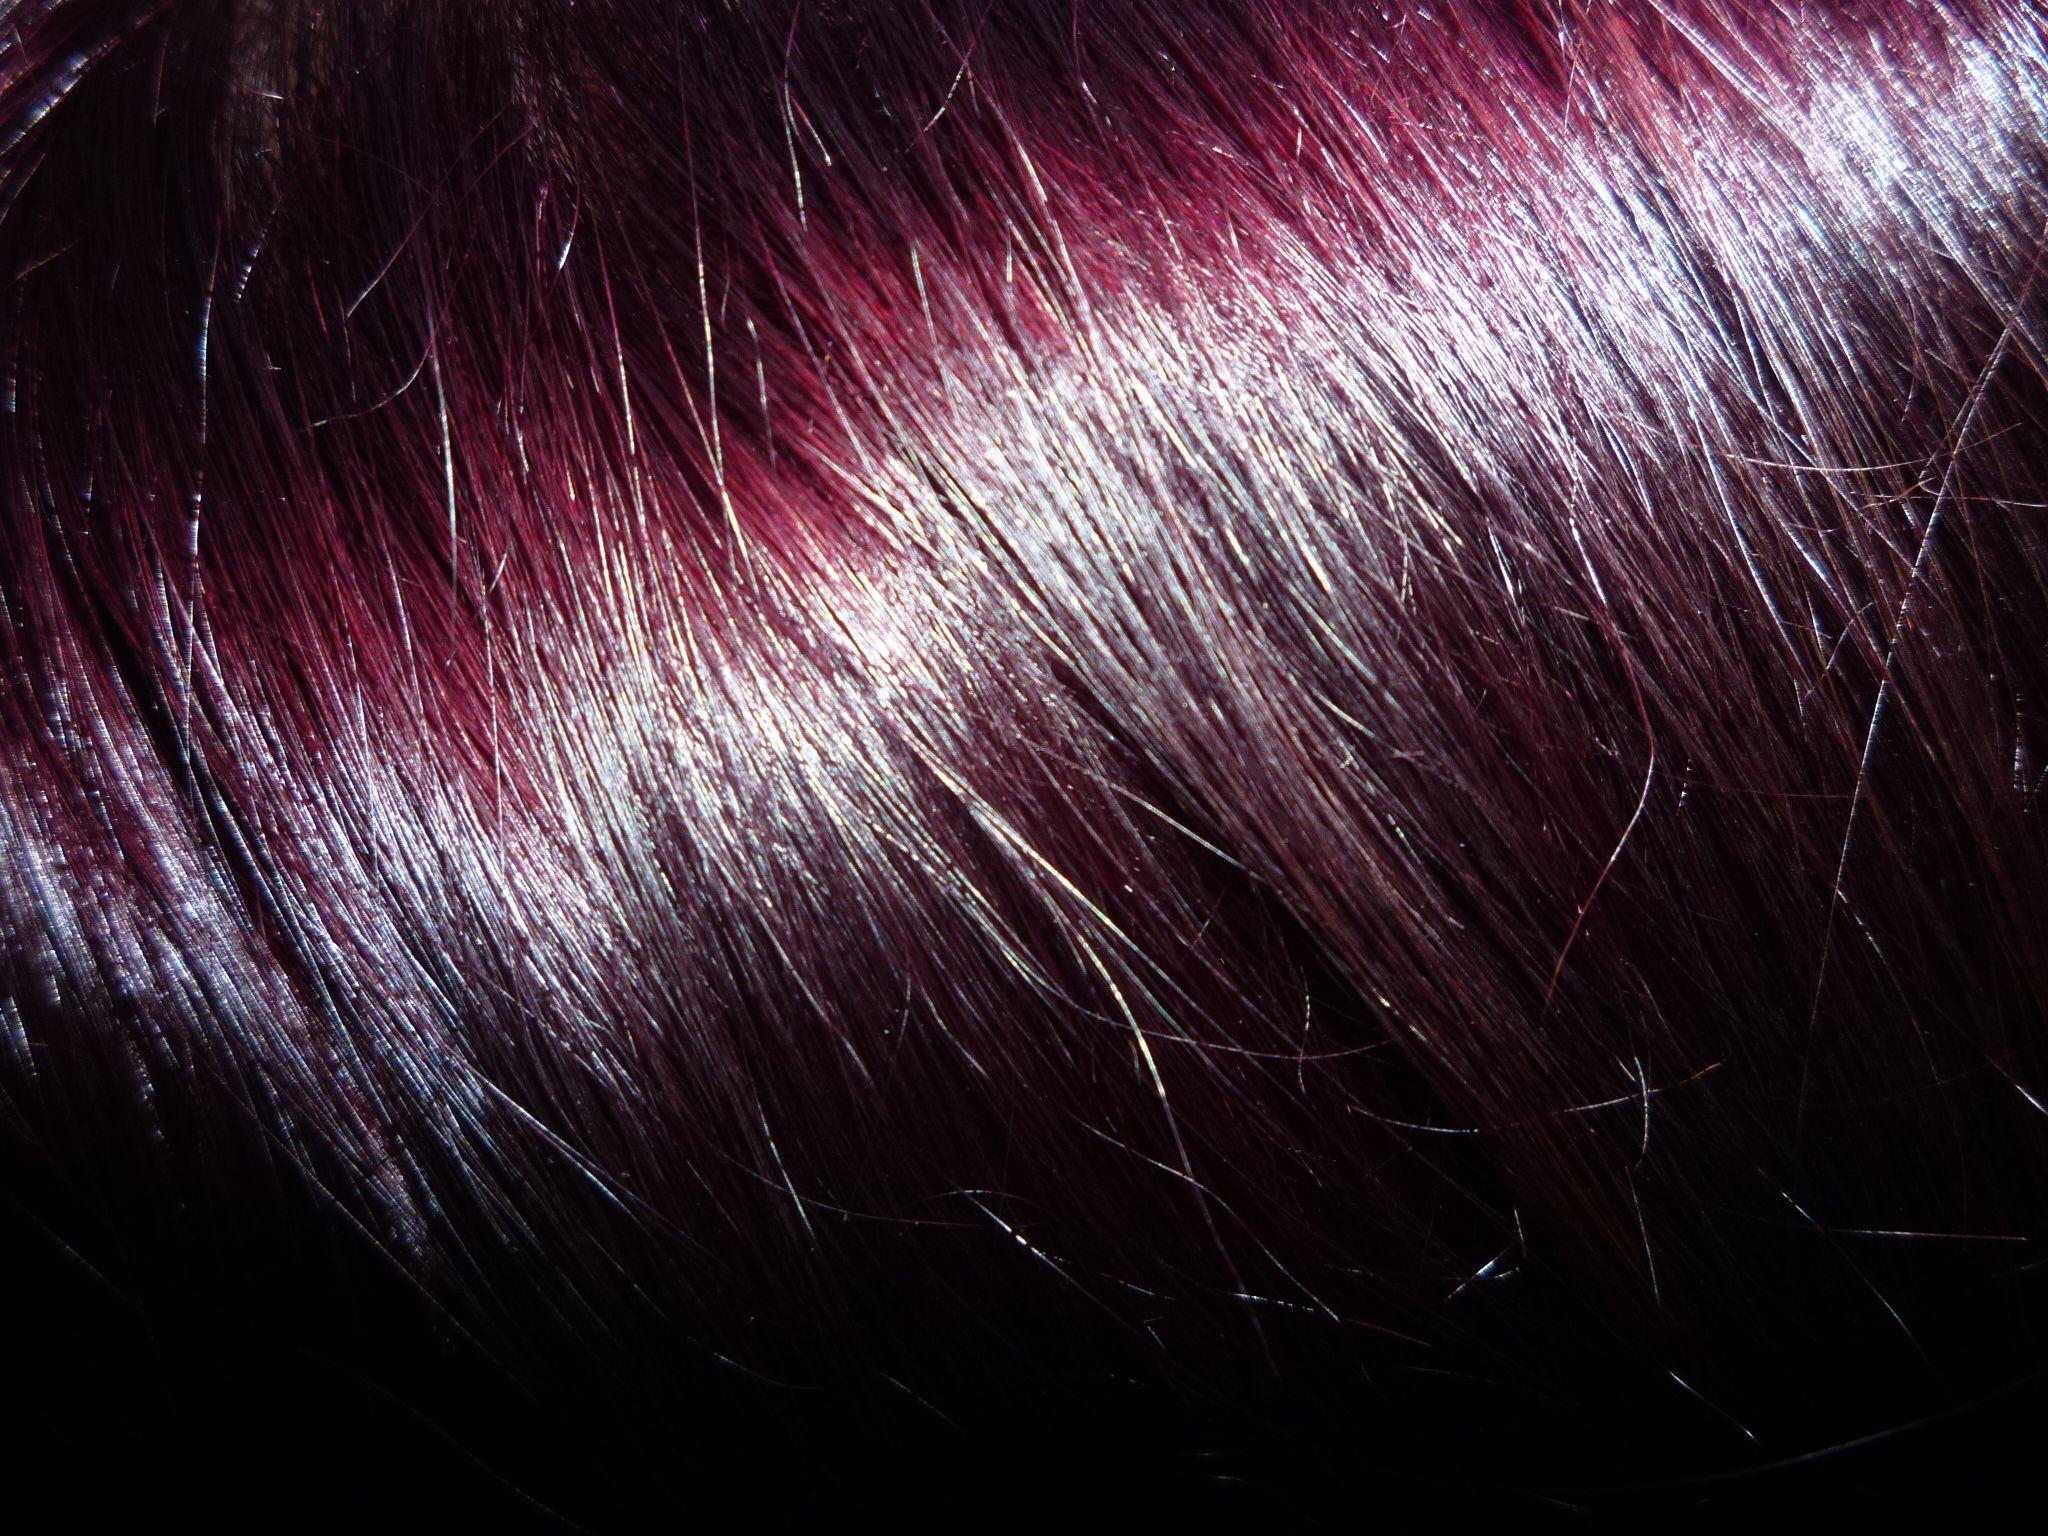 Black Cherry Hair Color Garnier Nutrisse Deep Burgundy Mane Indulgence Pinterest And